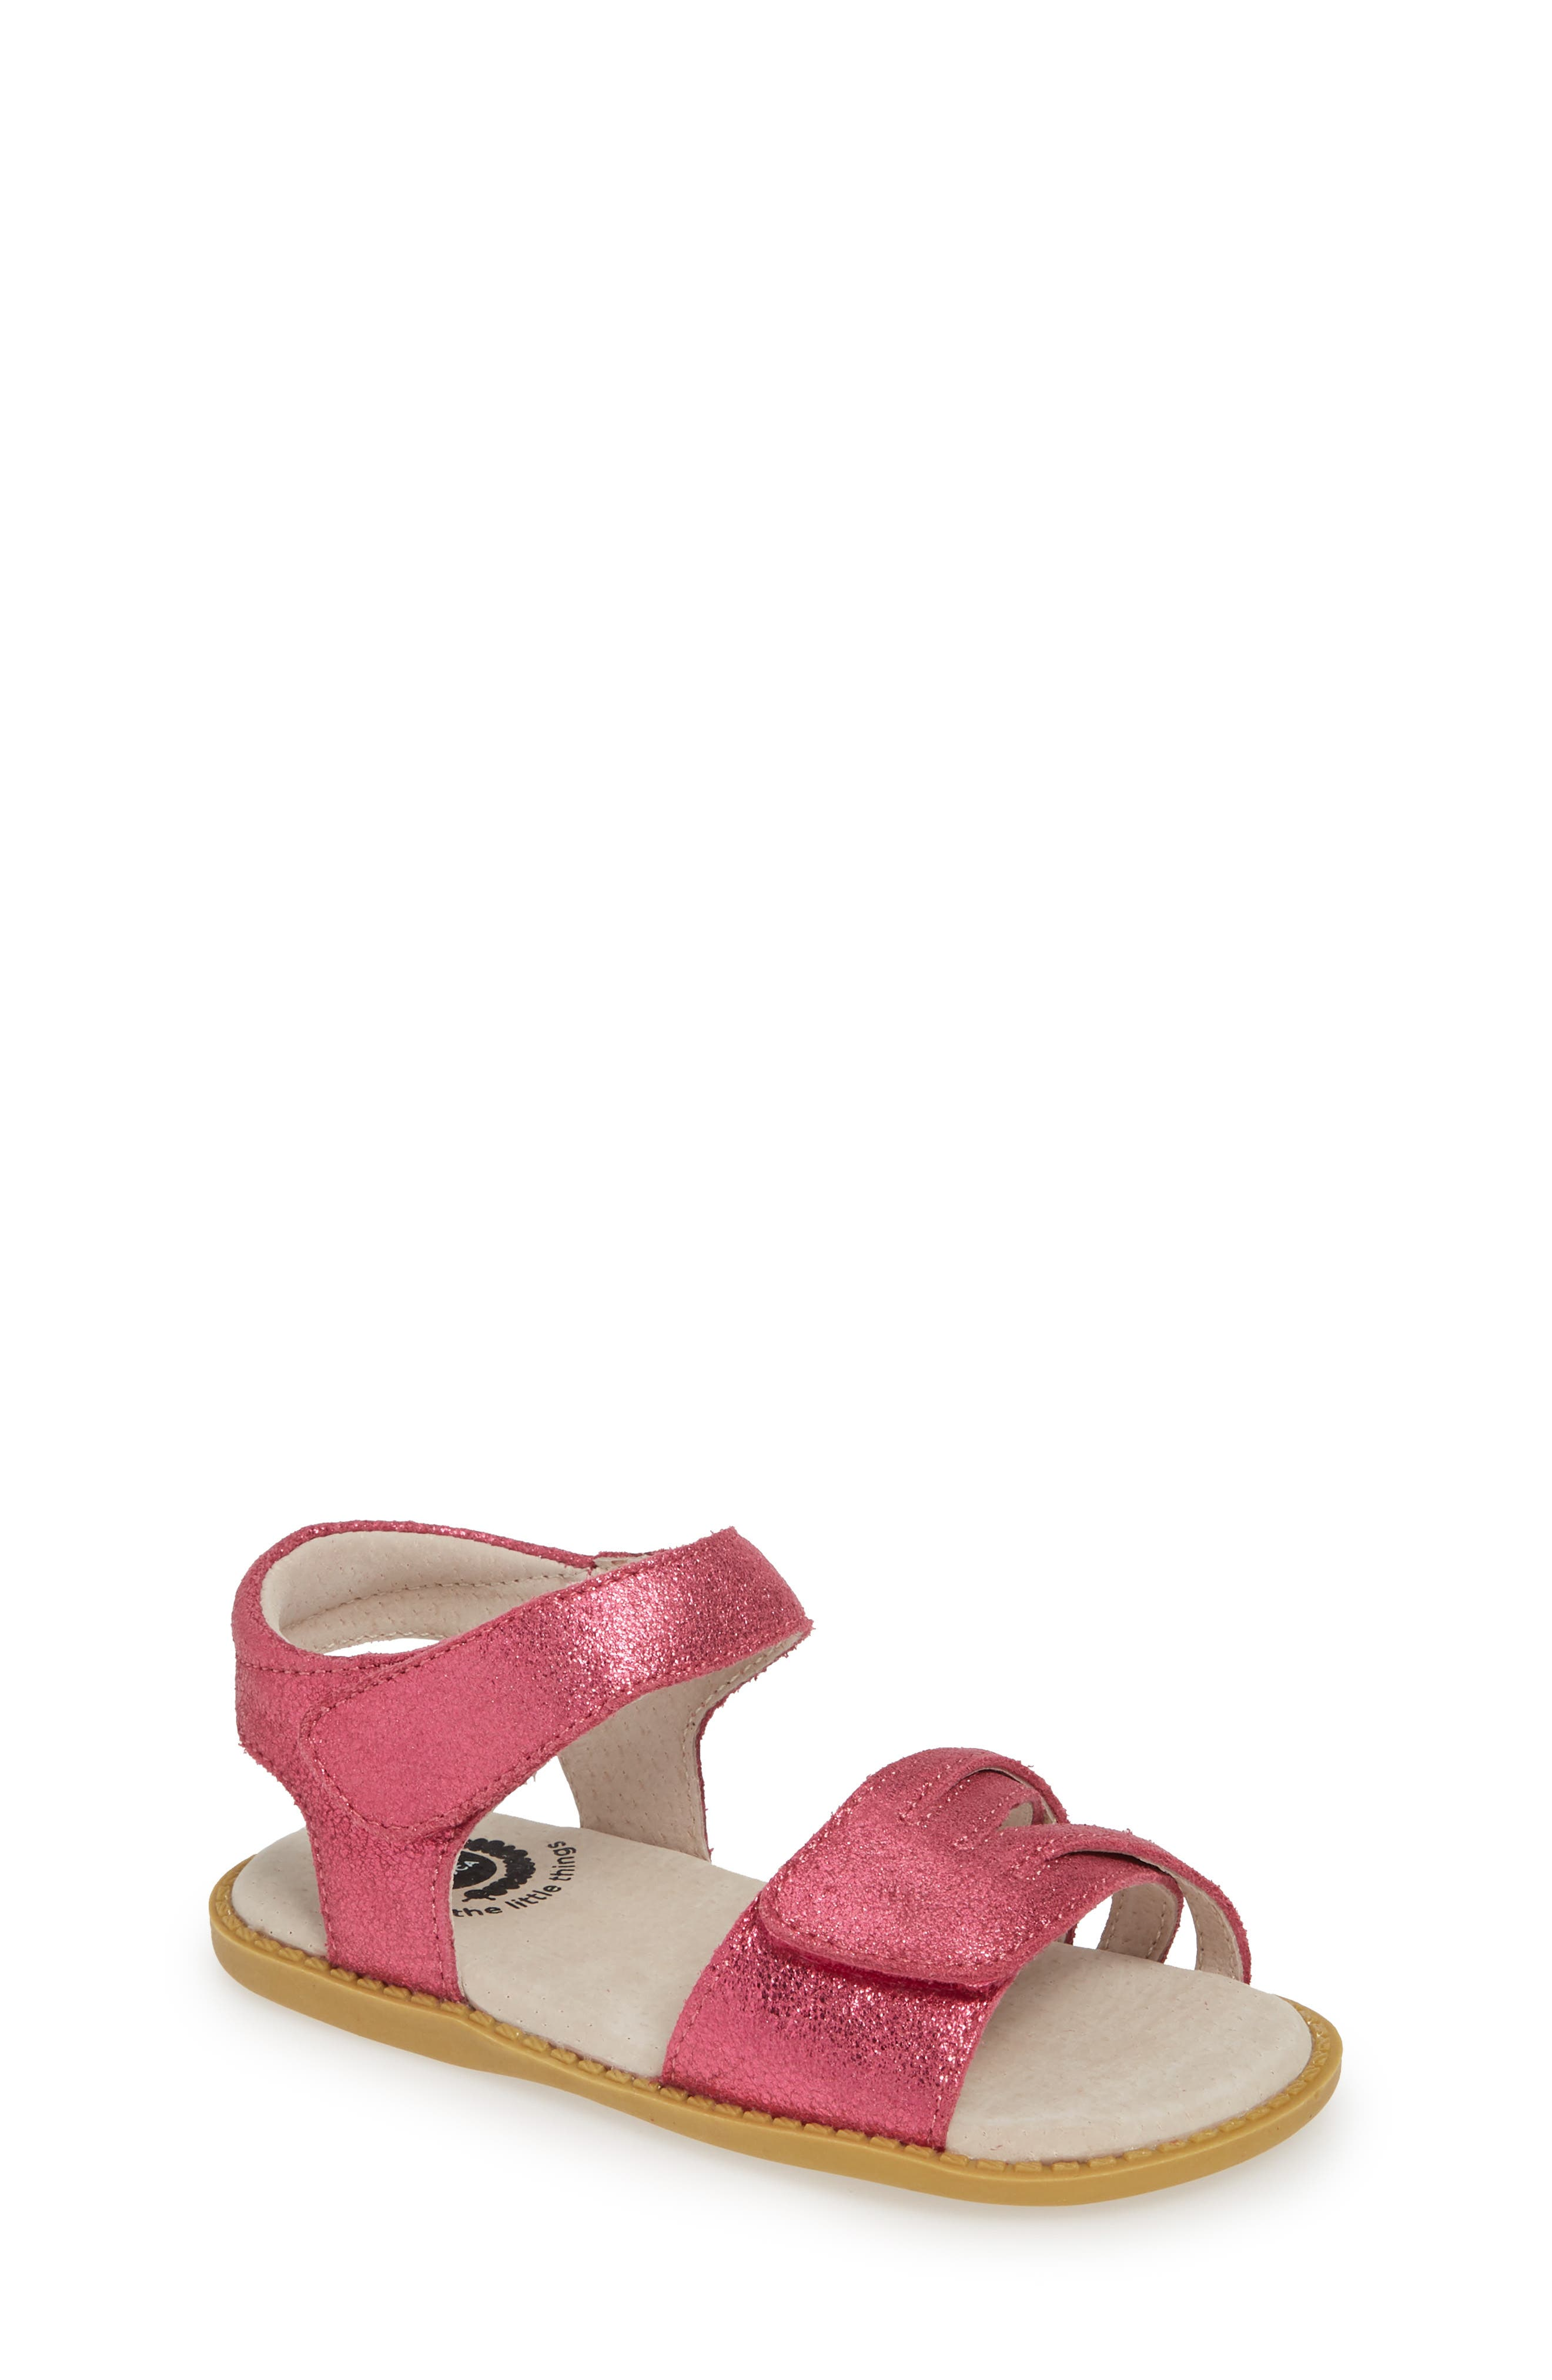 LIVIE & LUCA, 'Athena' Sandal, Main thumbnail 1, color, MAGENTA SHIMMER